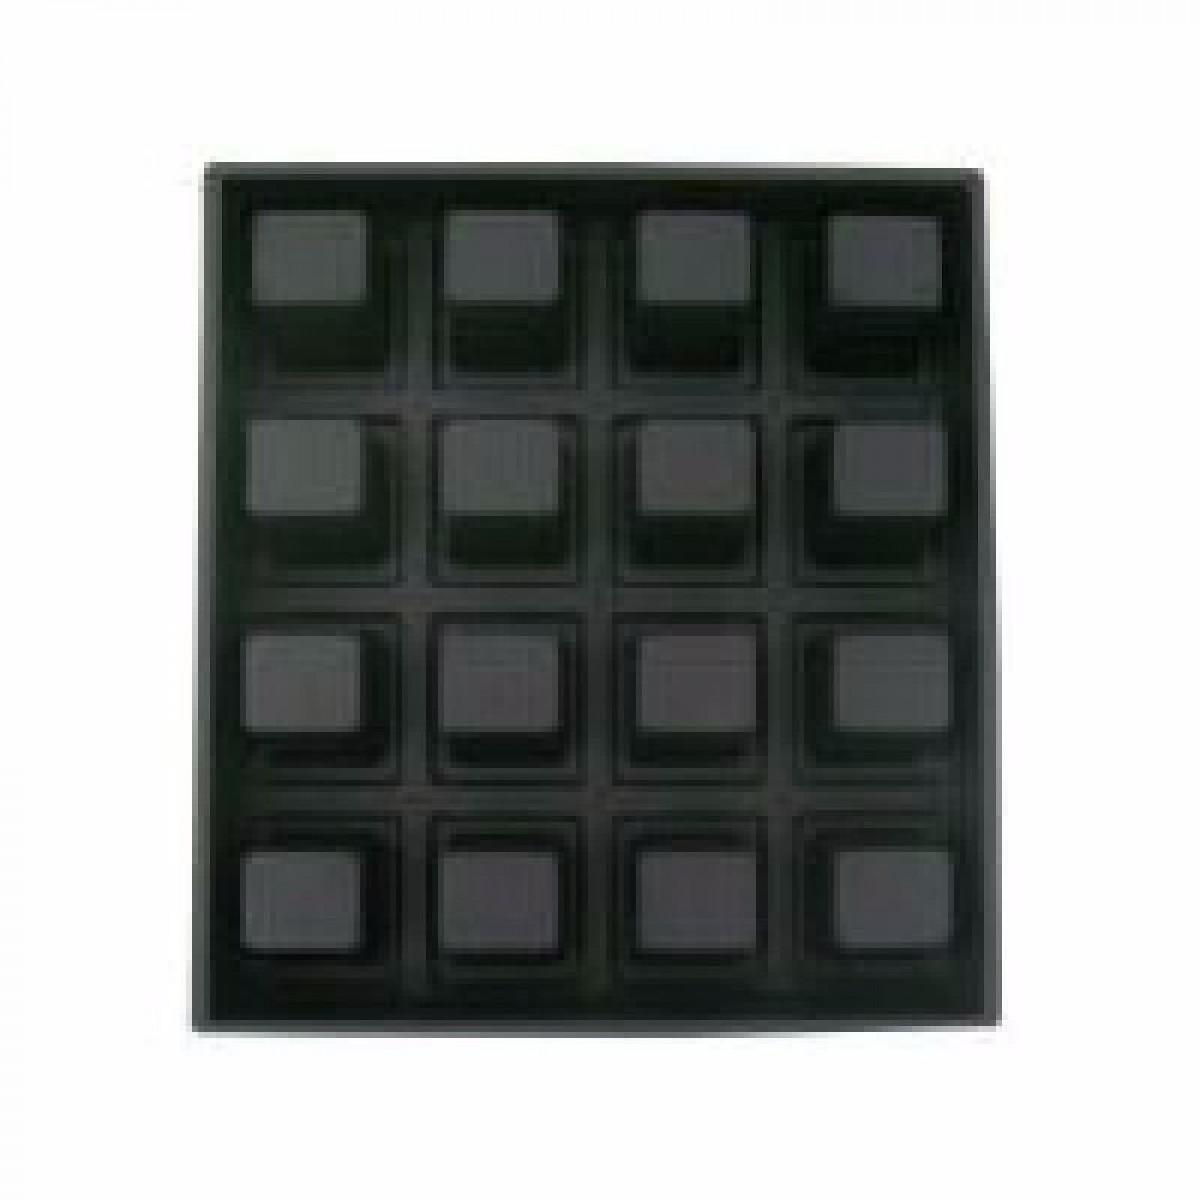 Foto 1 - Elemento Vazado ou Combugol FP053 40x44x7 4,9PÇS P/M²